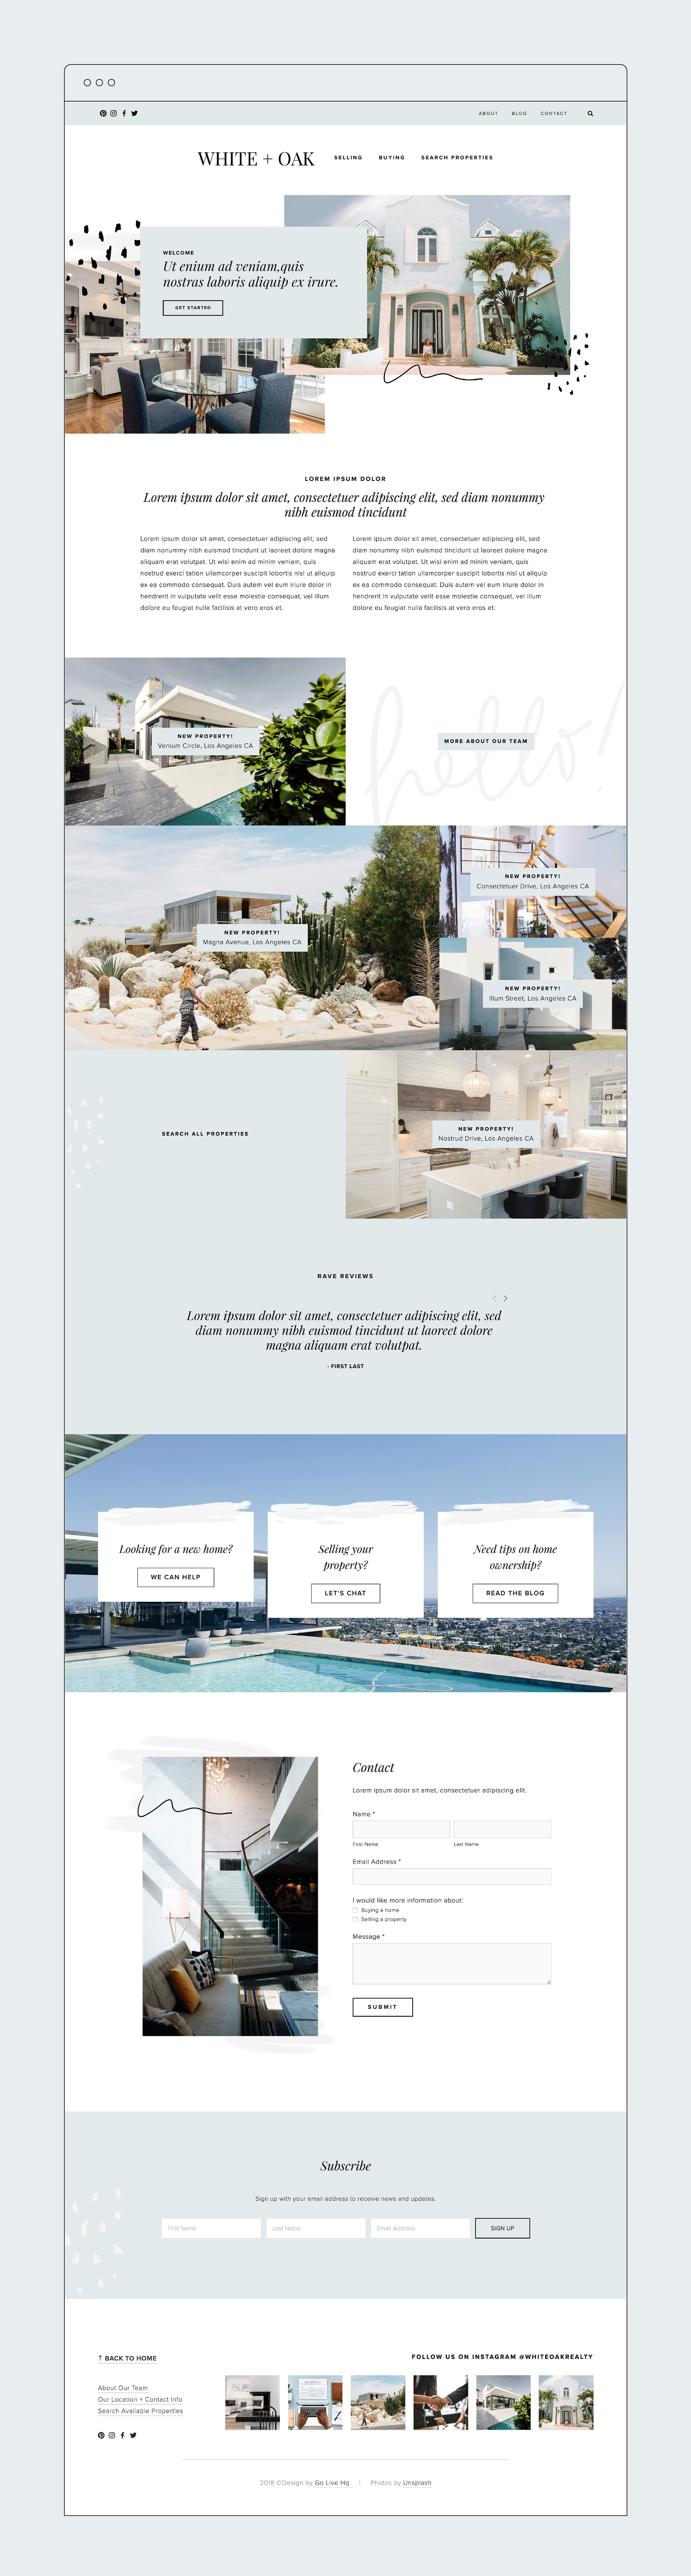 whiteoakLongLaunch_Graphictemplates.jpg